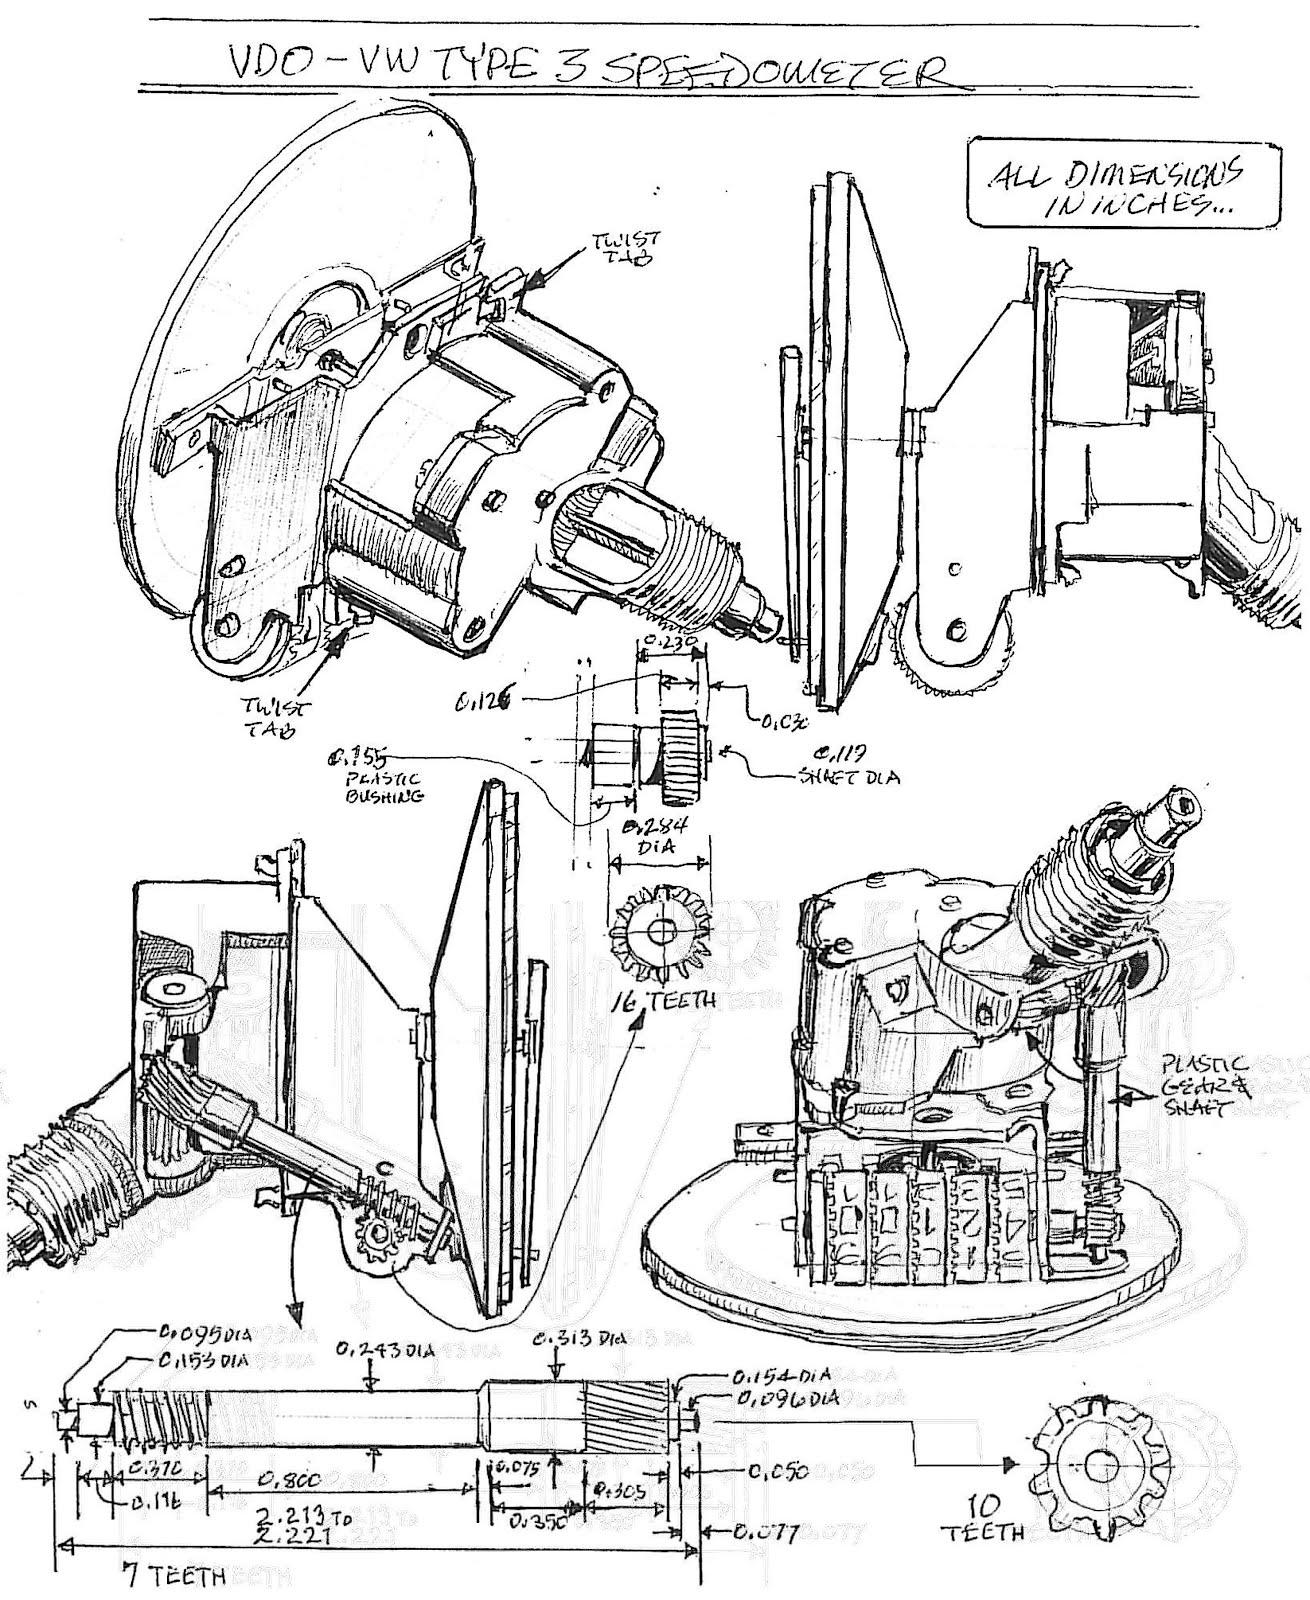 Awesome Vdo Oil Temp Gauge Wiring Diagram Illustration - Everything ...